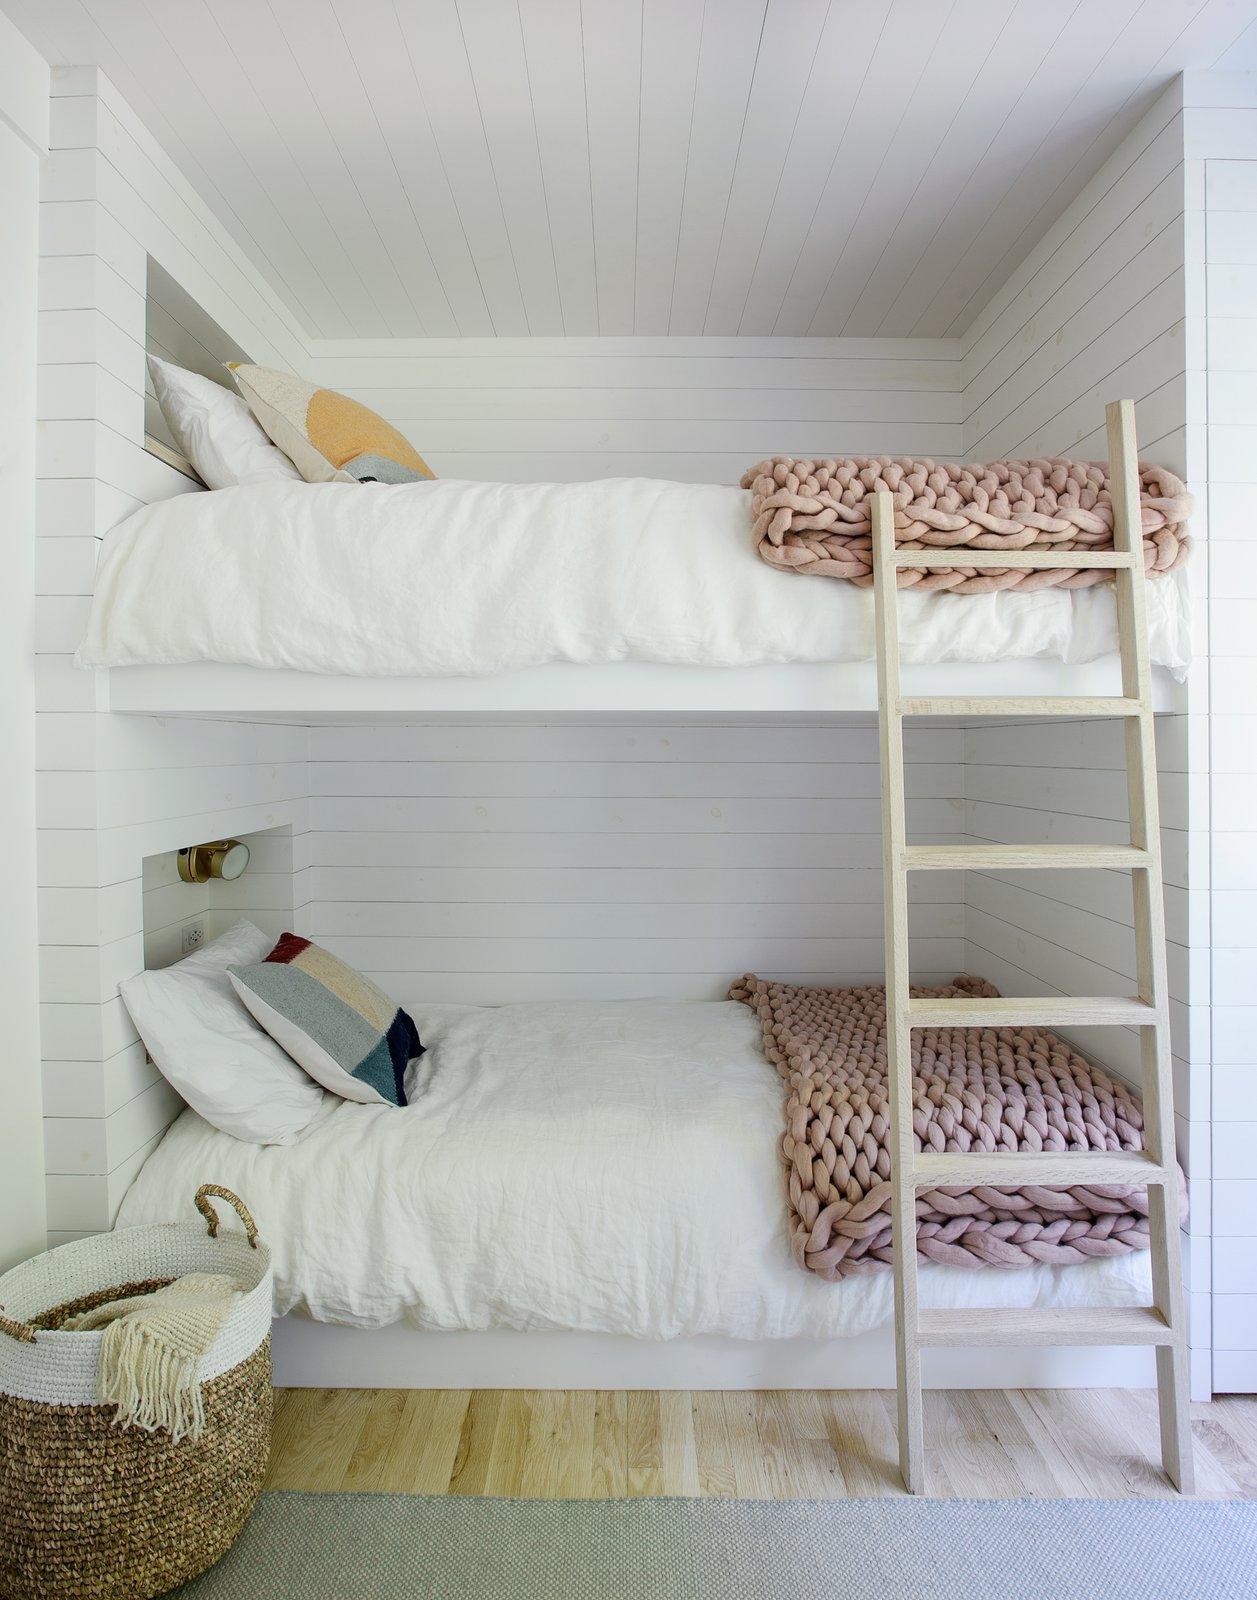 Bedroom, Light Hardwood, Rug, Wall, and Bunks  Best Bedroom Wall Rug Light Hardwood Photos from A Hamptons Beach Retreat Gets a Scandinavian-Style Makeover